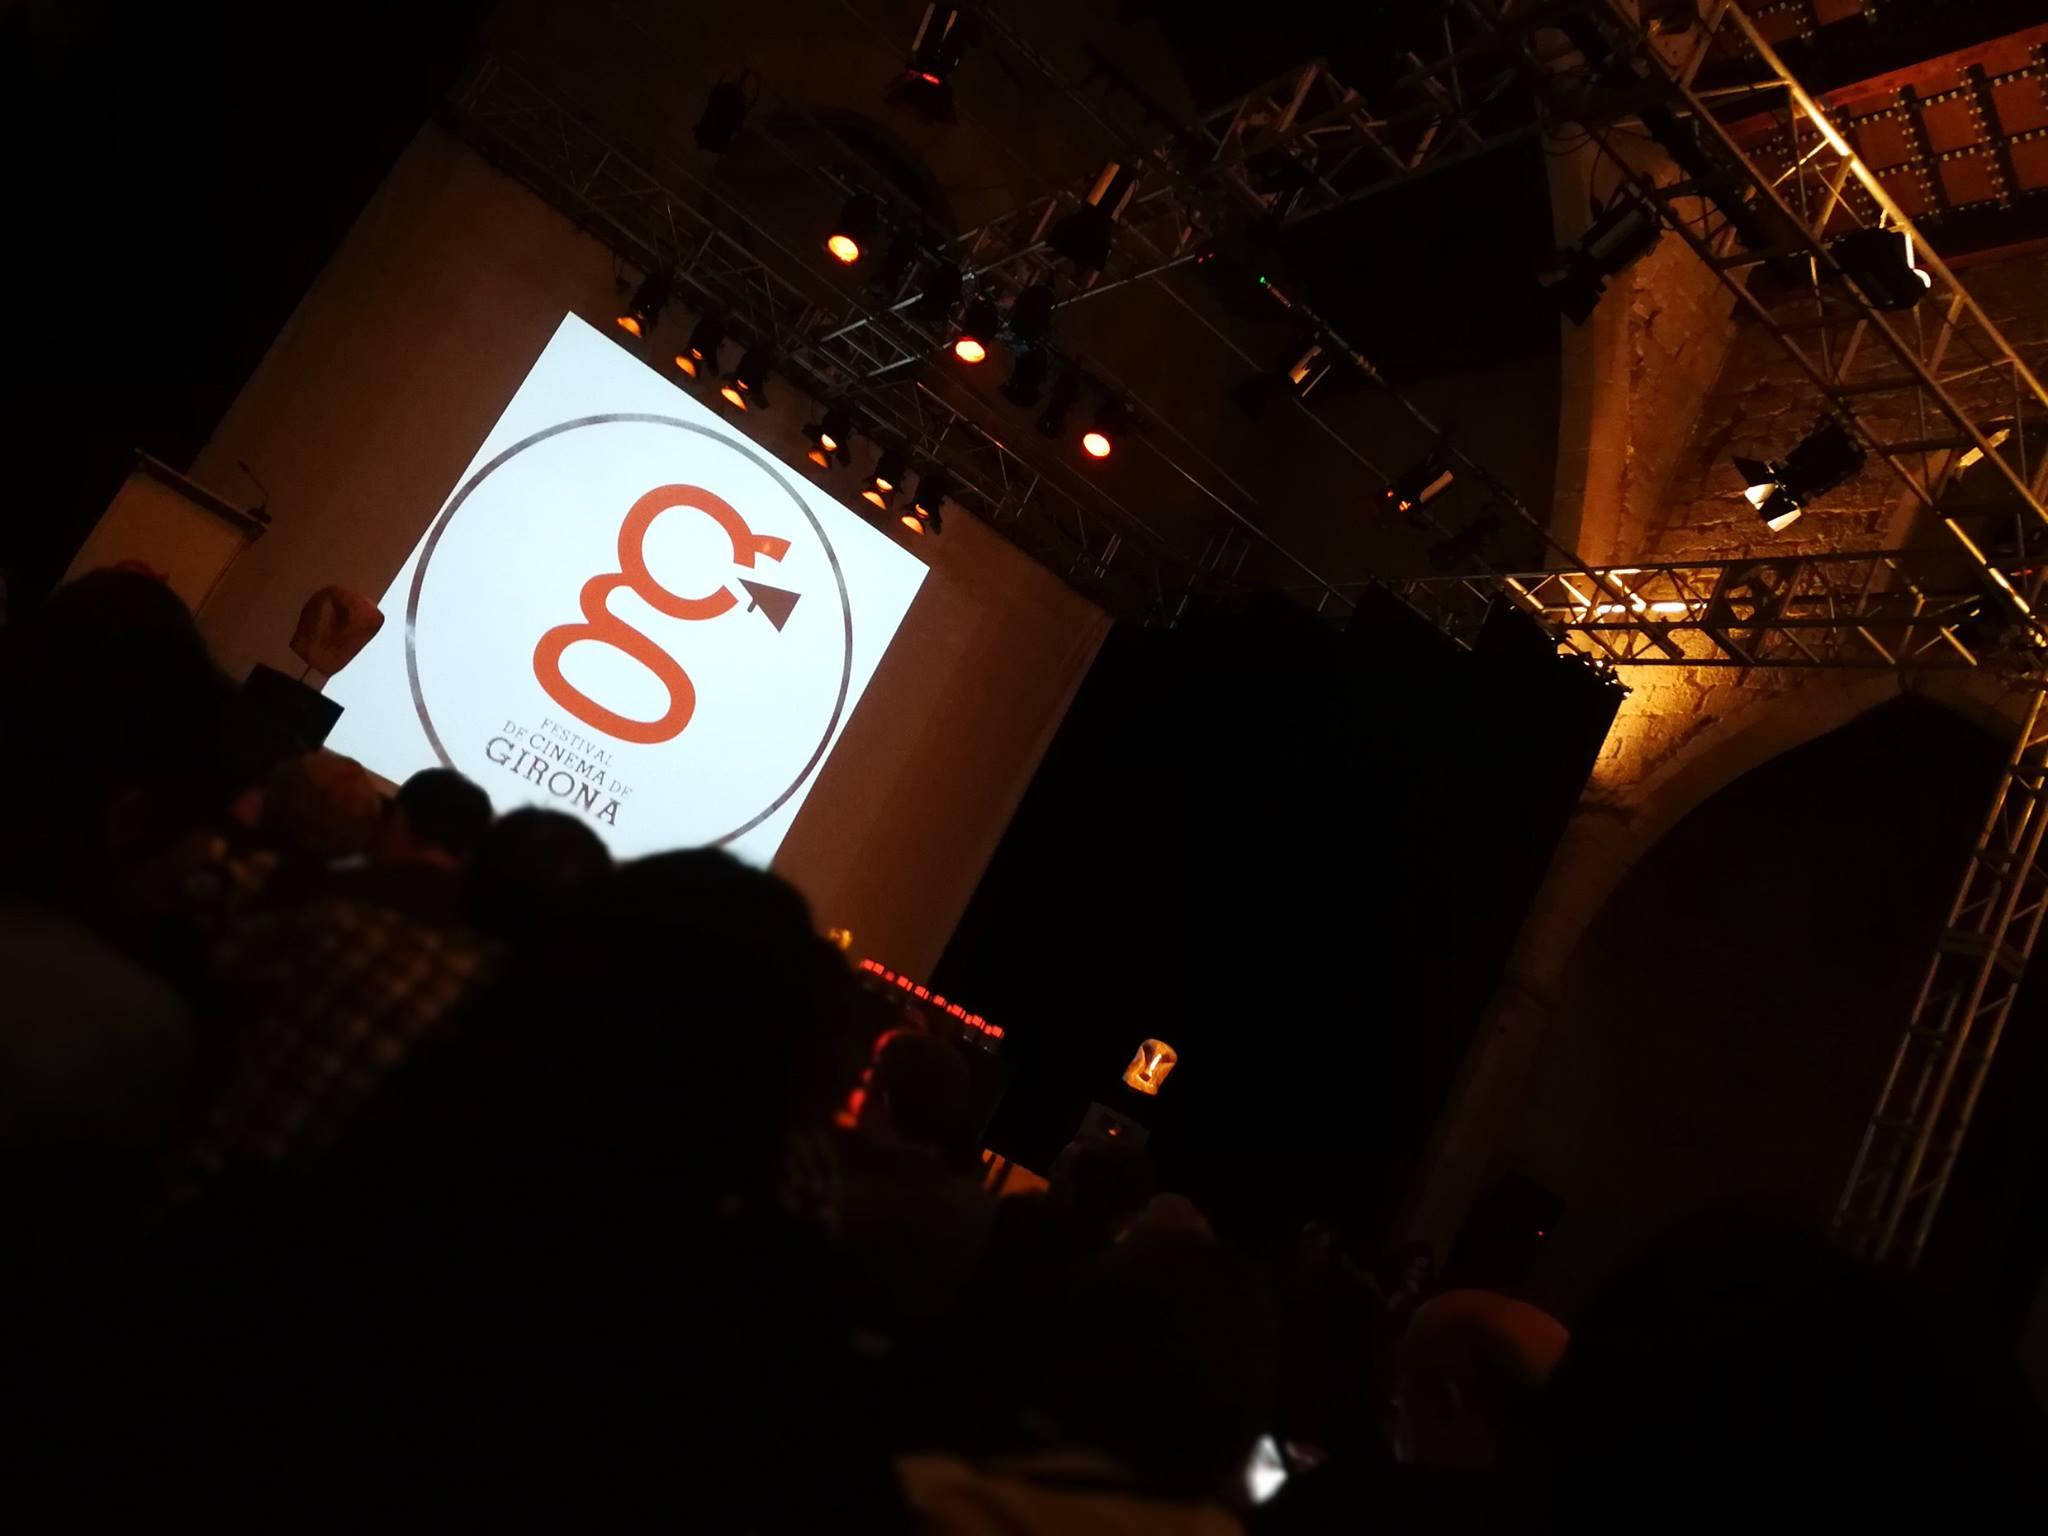 Festival du Film de Girona – realisateur de clip